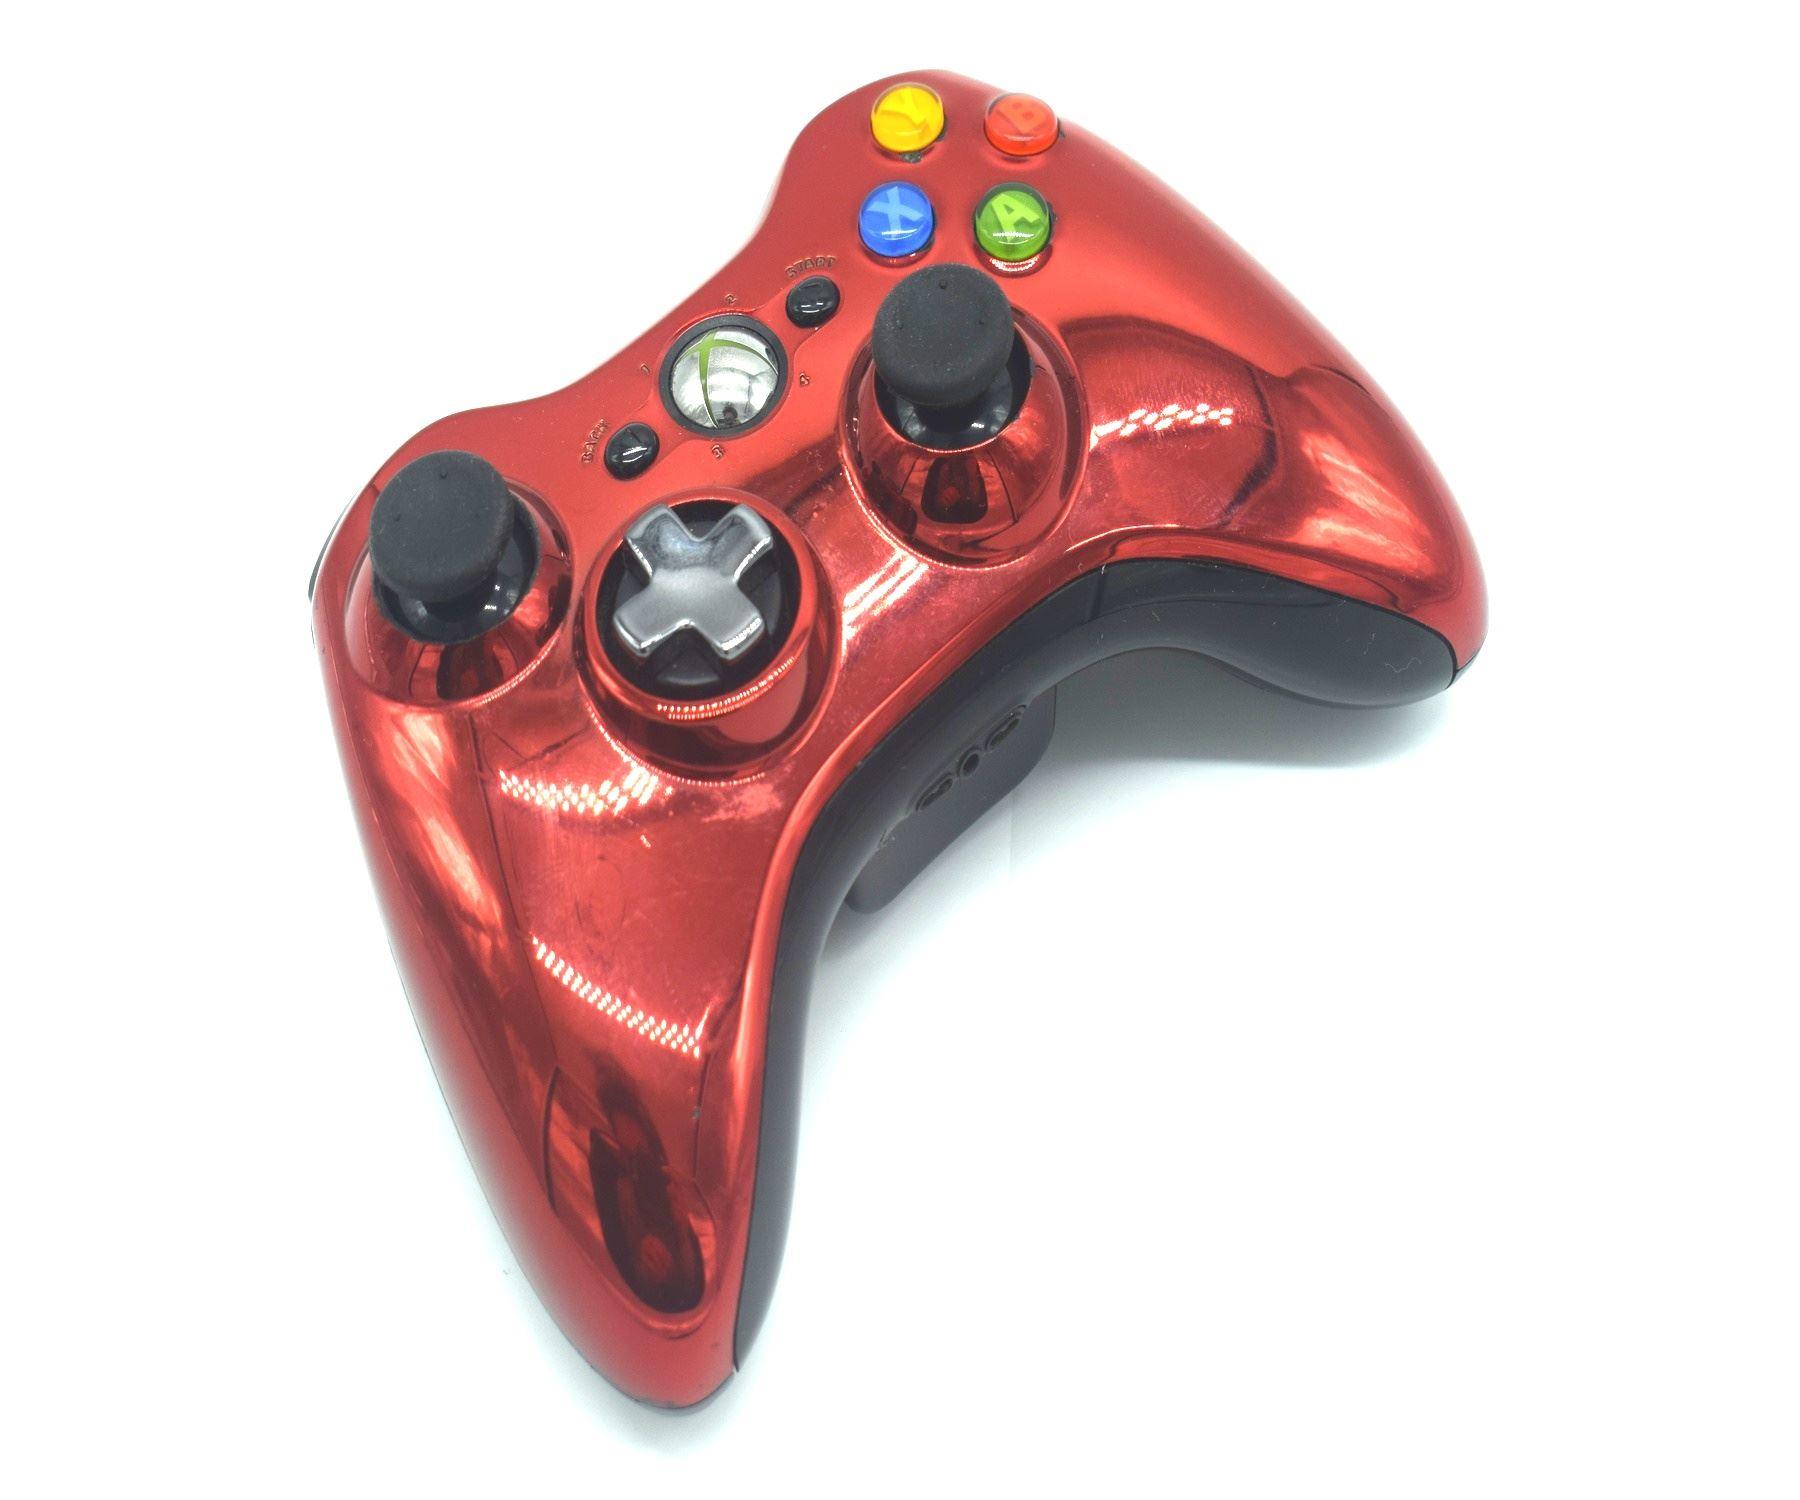 Official-Original-Genuine-Microsoft-Xbox-360-Controller-Pads-Various-Colours thumbnail 23